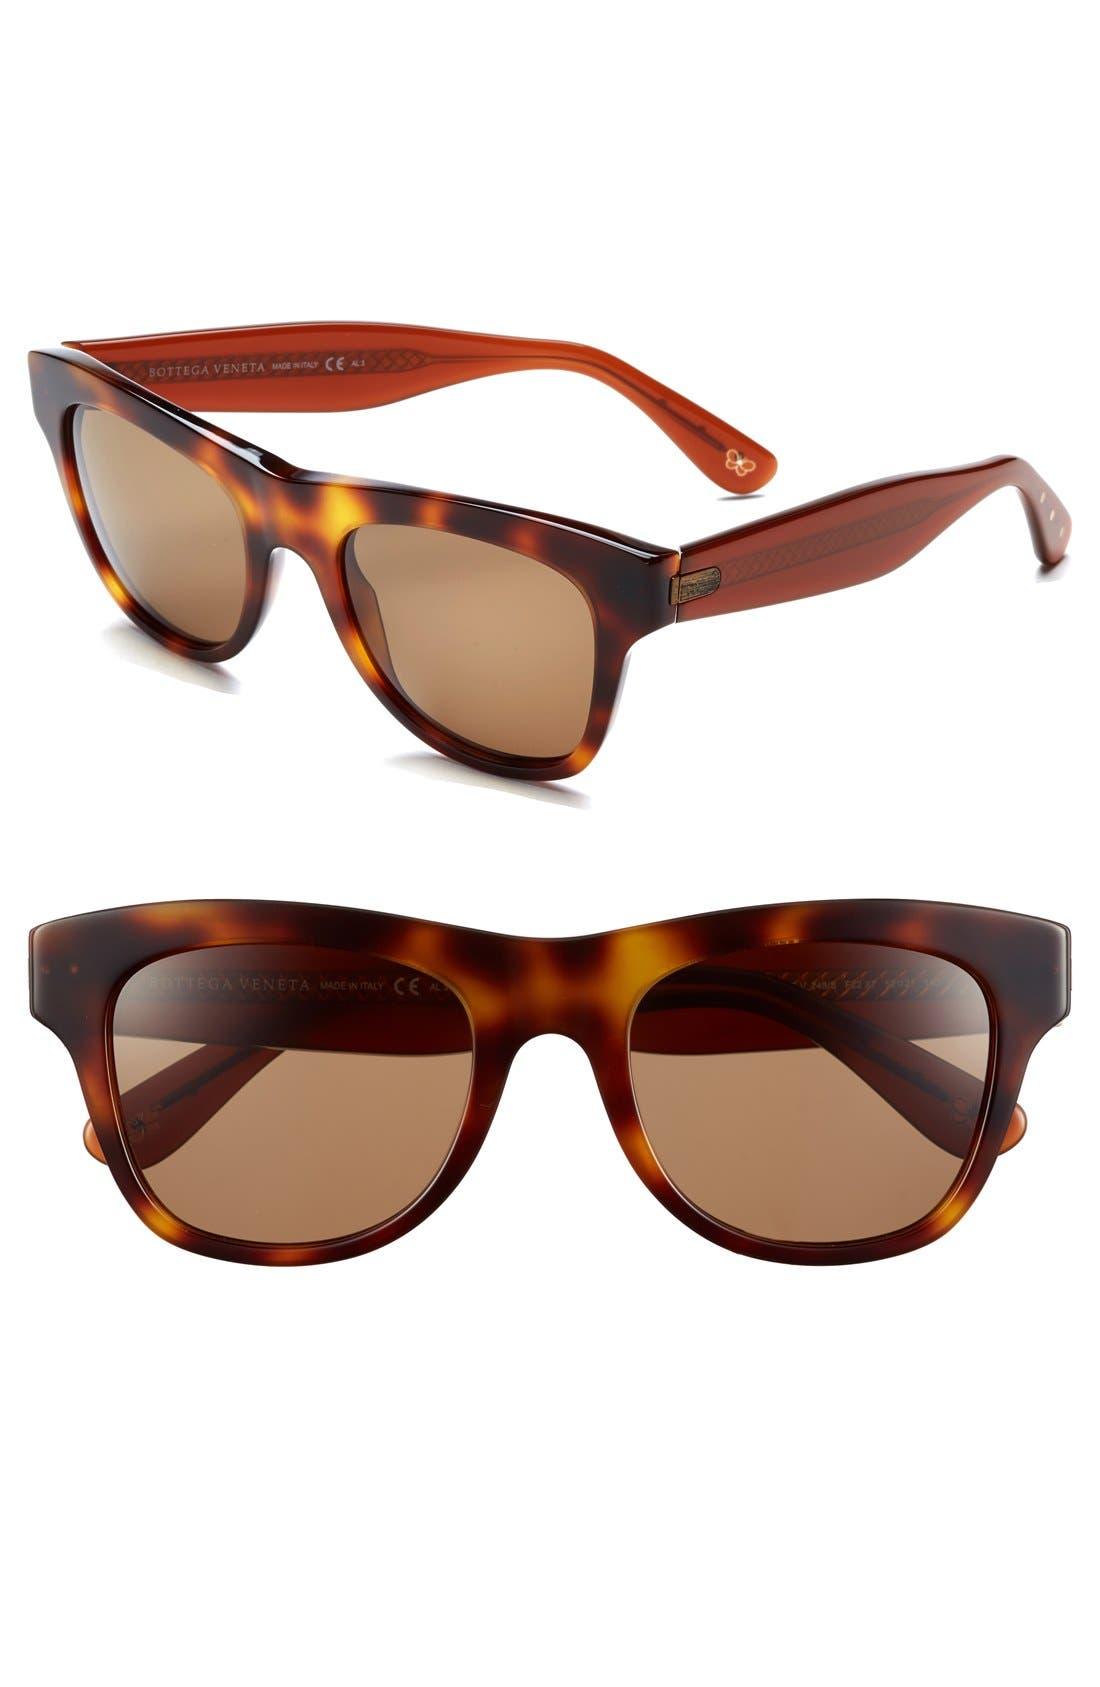 Alternate Image 1 Selected - Bottega Veneta 52mm Retro Sunglasses